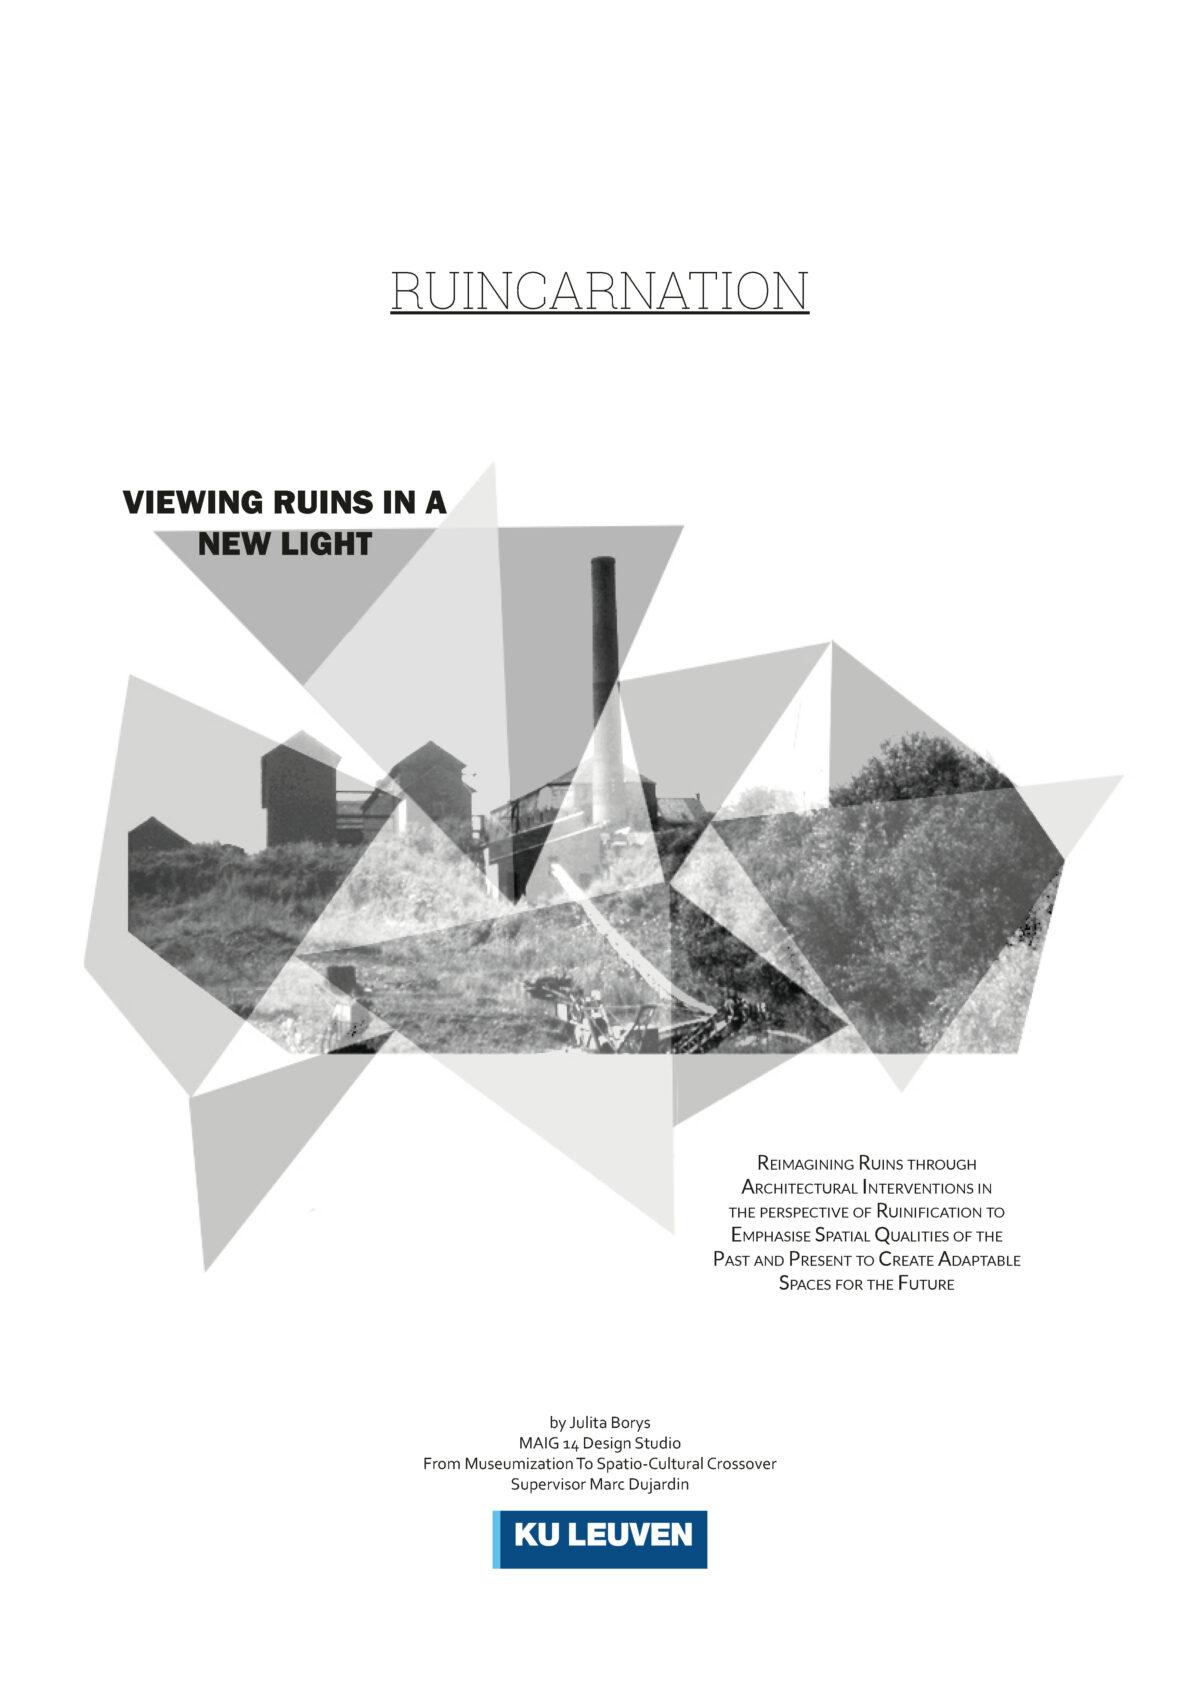 ruincarnation-julita-borys-leporello-maig14-2019-2020-1